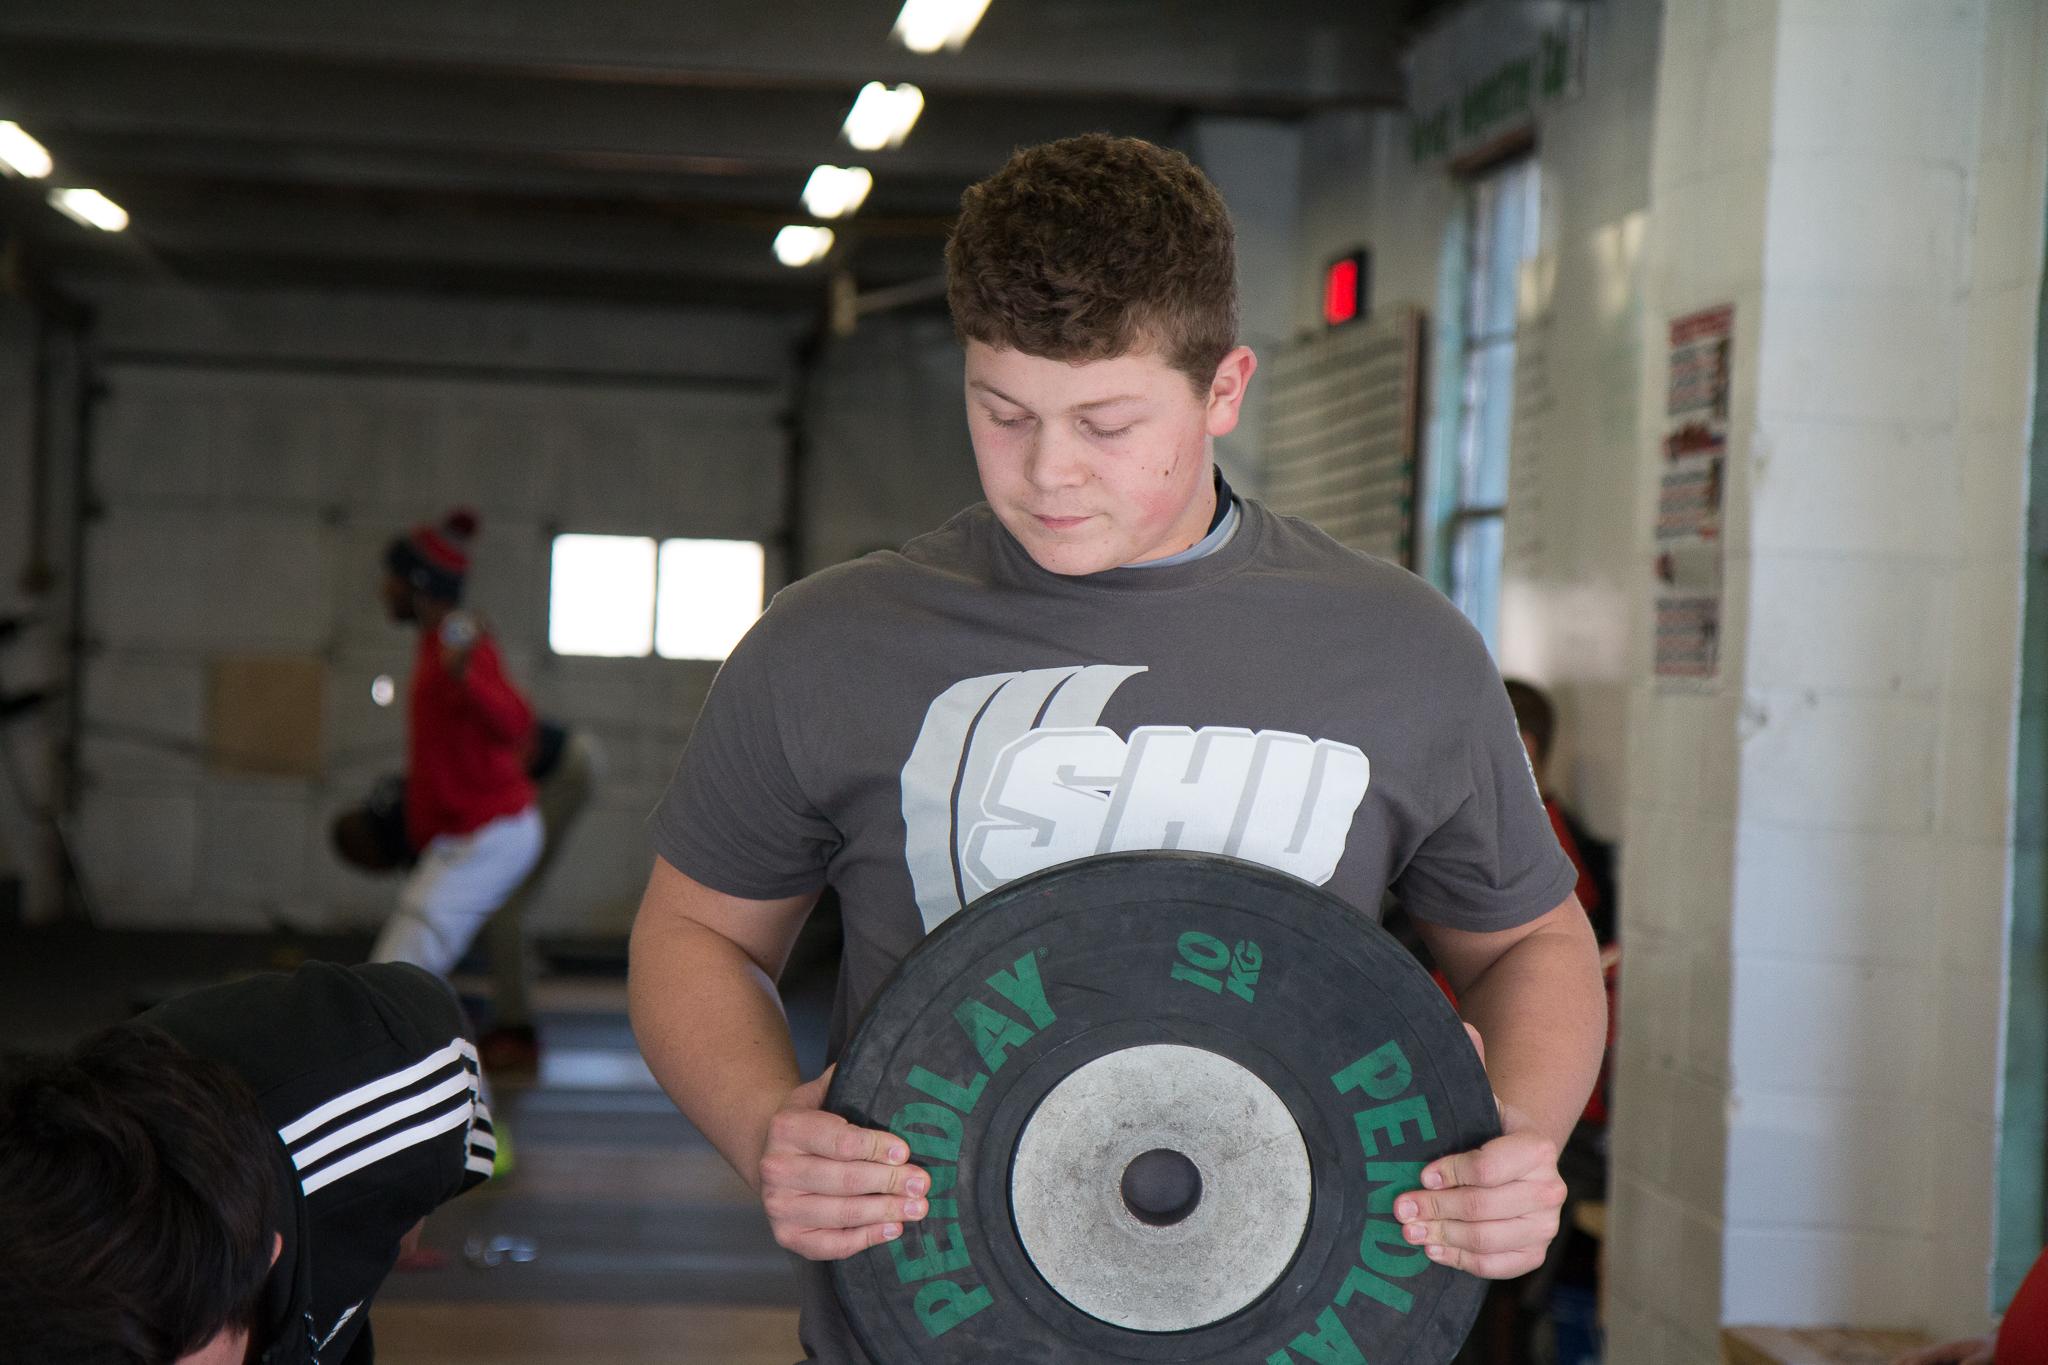 men-warwick-new-york-intrepid-strength-conditioning-winter-open-weightlifting-meet-weightlifting-photography (1 of 24).jpg